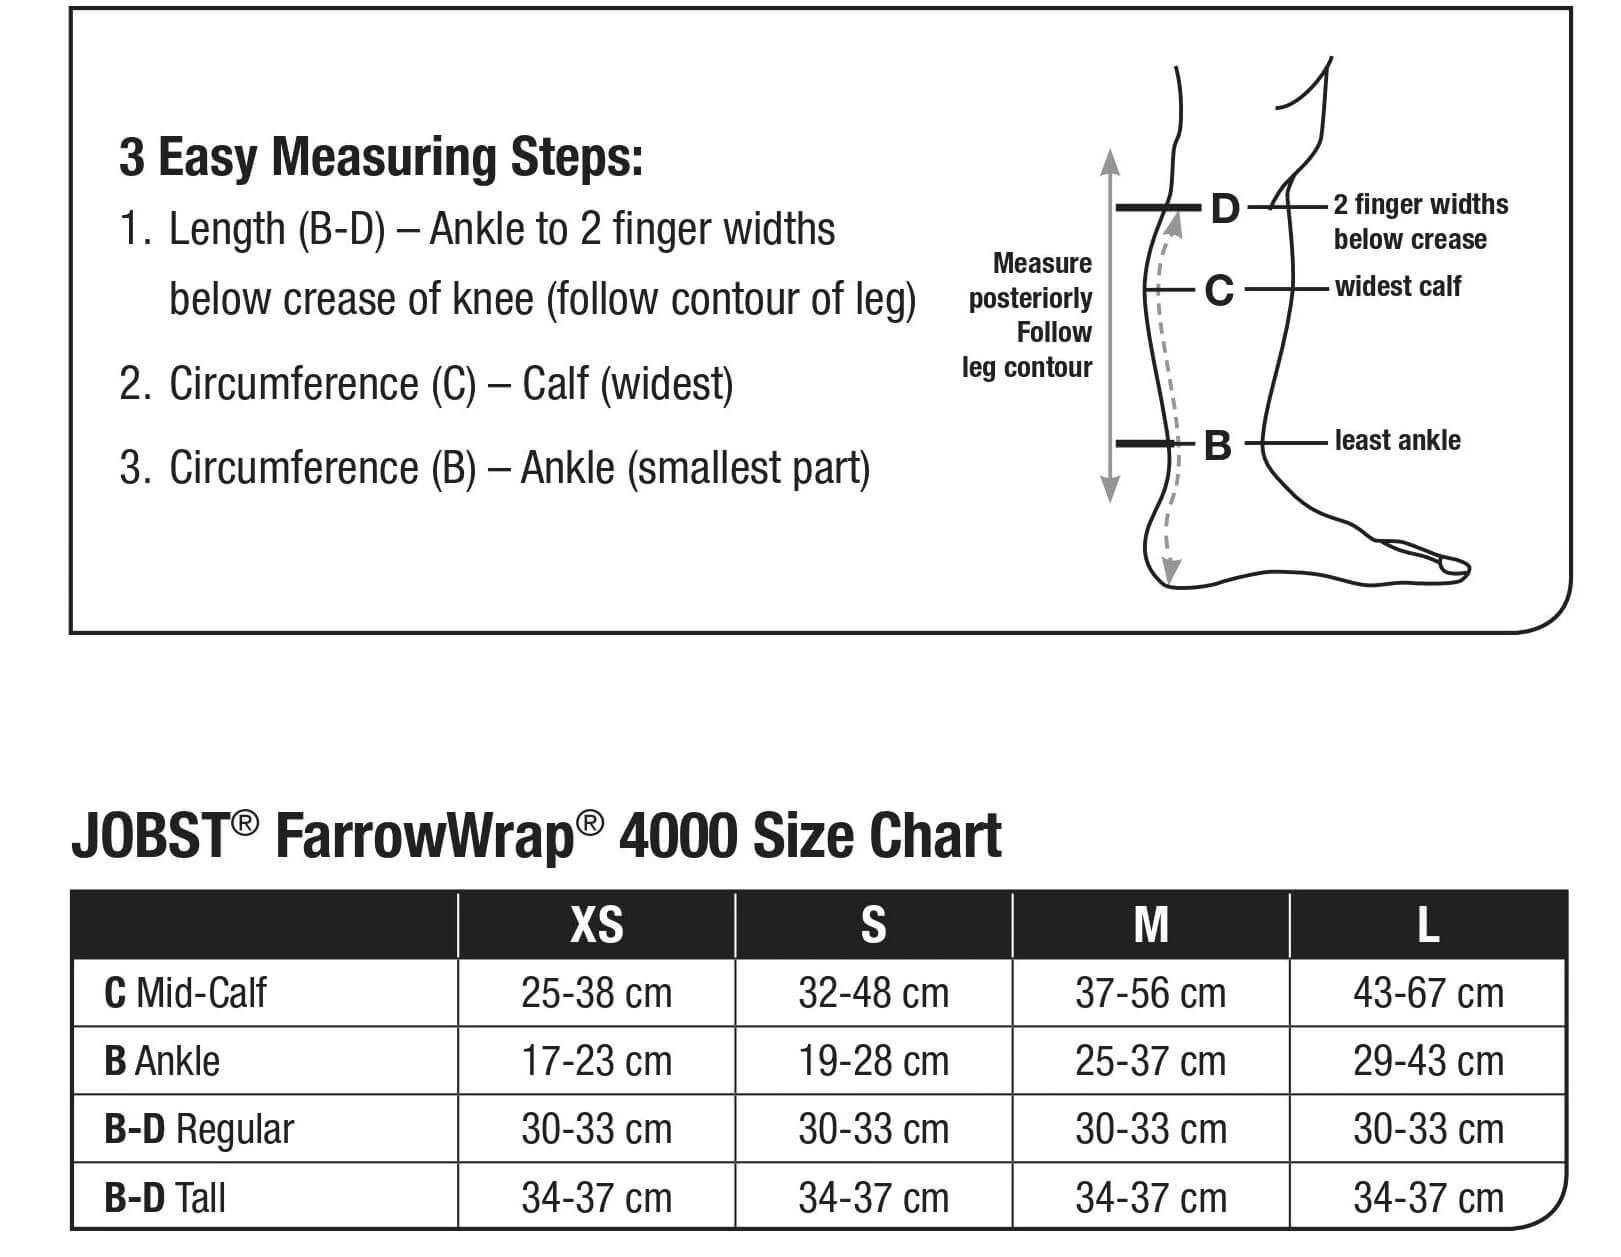 jobst-farrow-wrap-4000-legpiece-sizing-chart.jpg